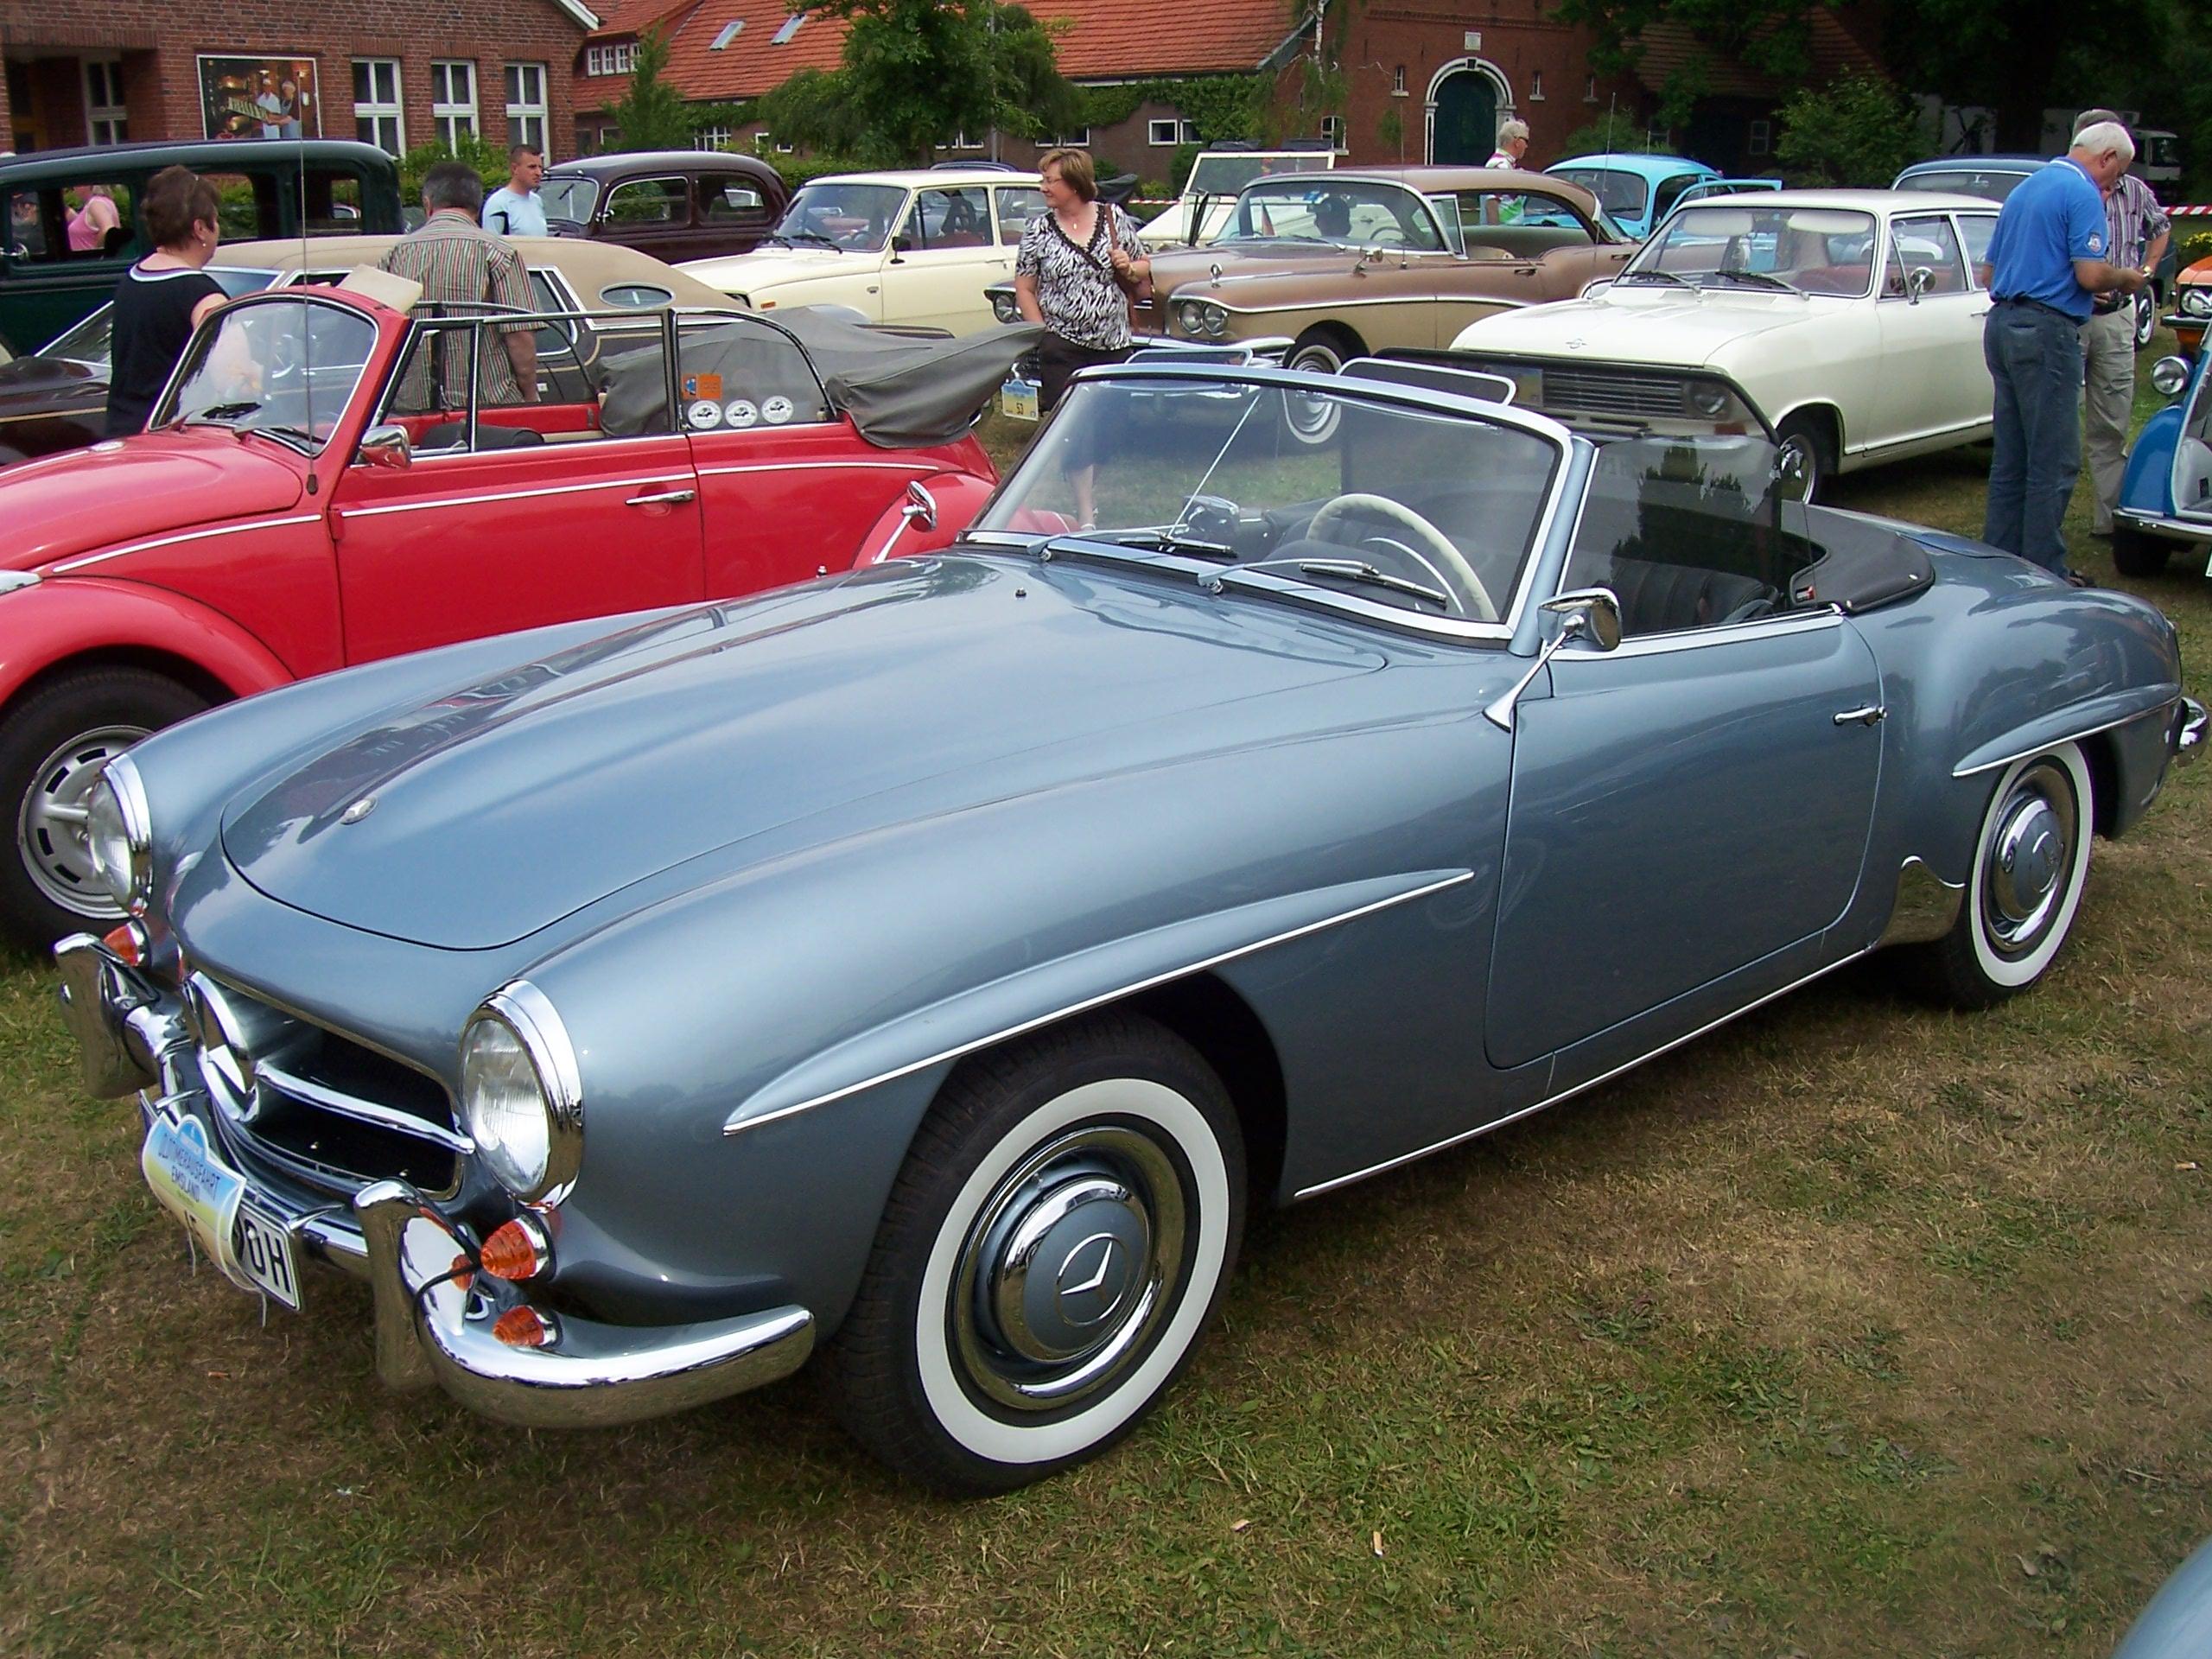 Maintaining Classic Cars